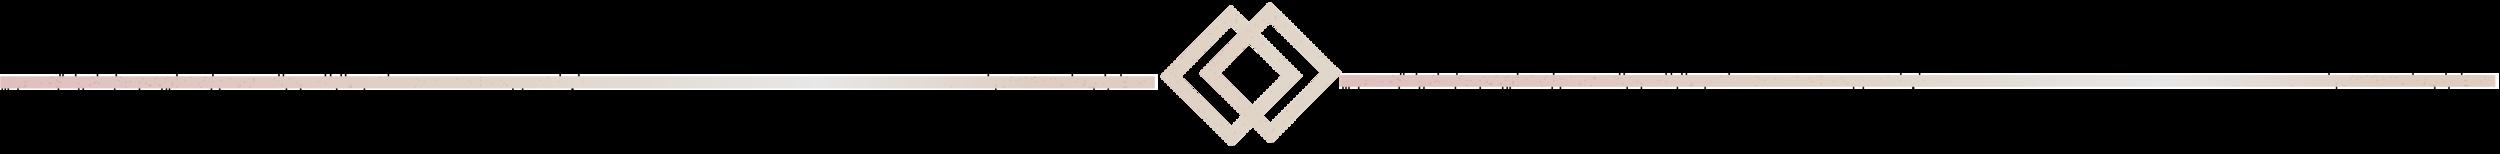 gradient divider-01-01.png